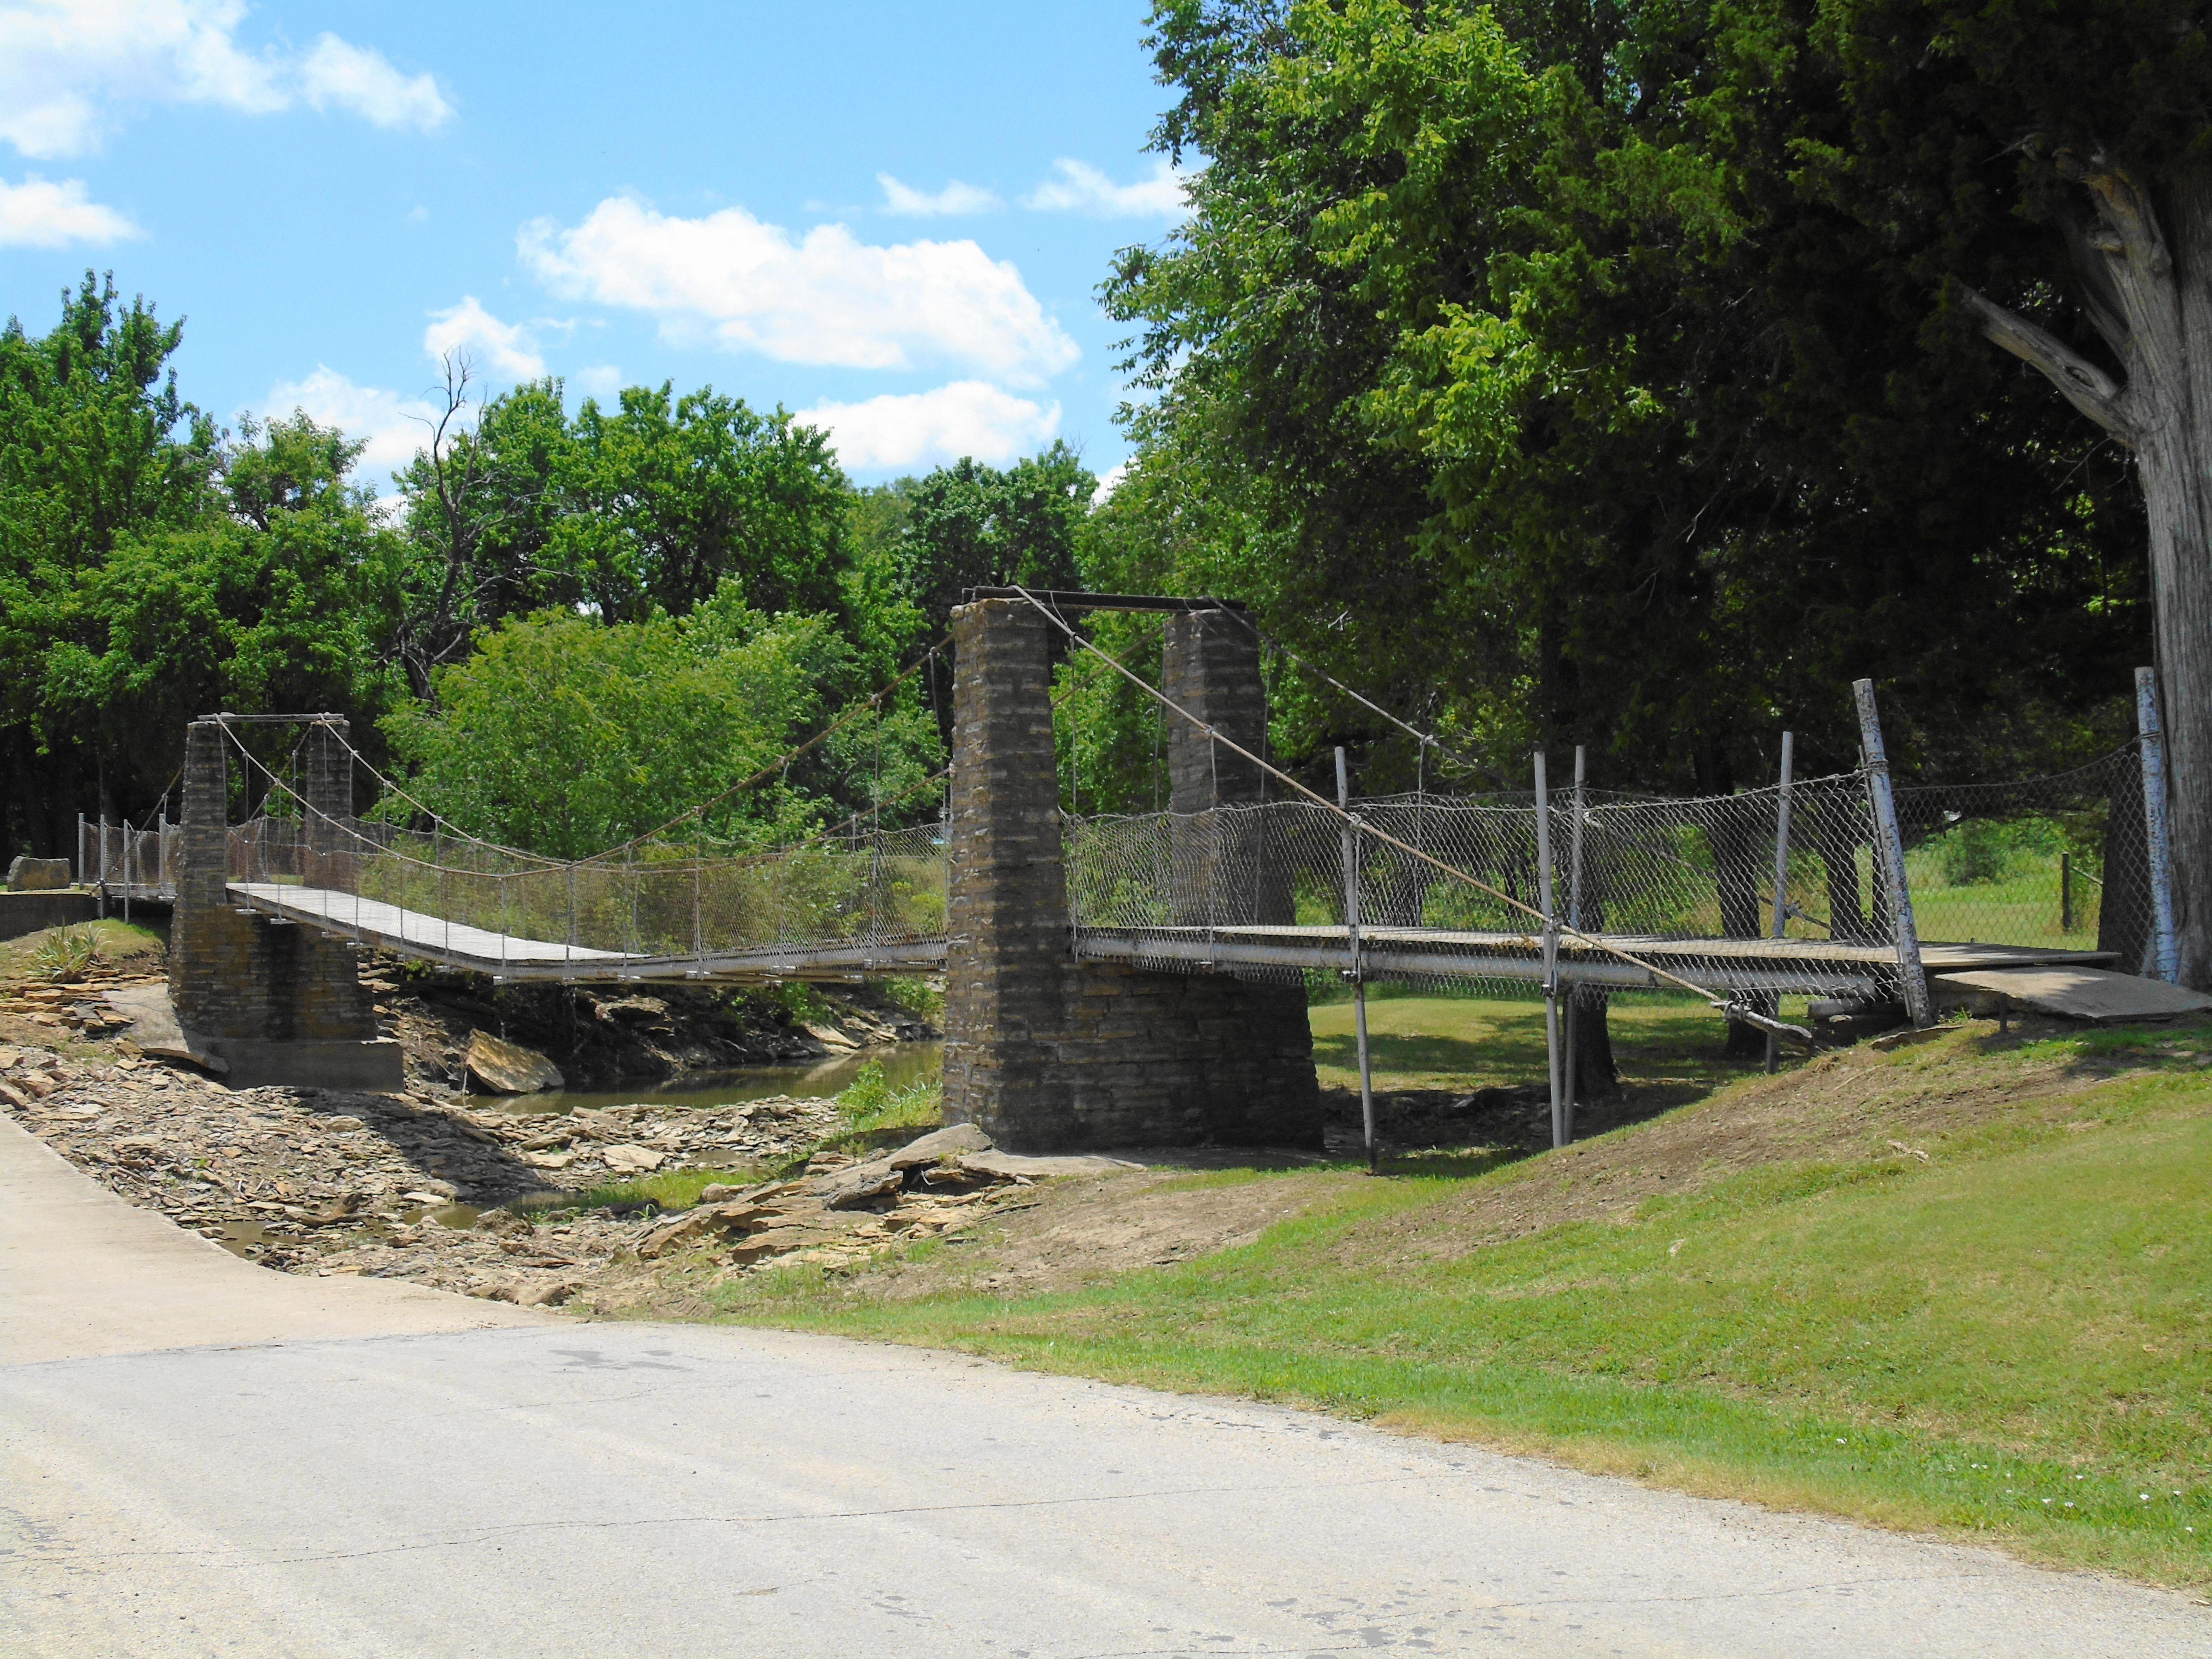 Old swinging bridge at burnsville wv - Nude Images